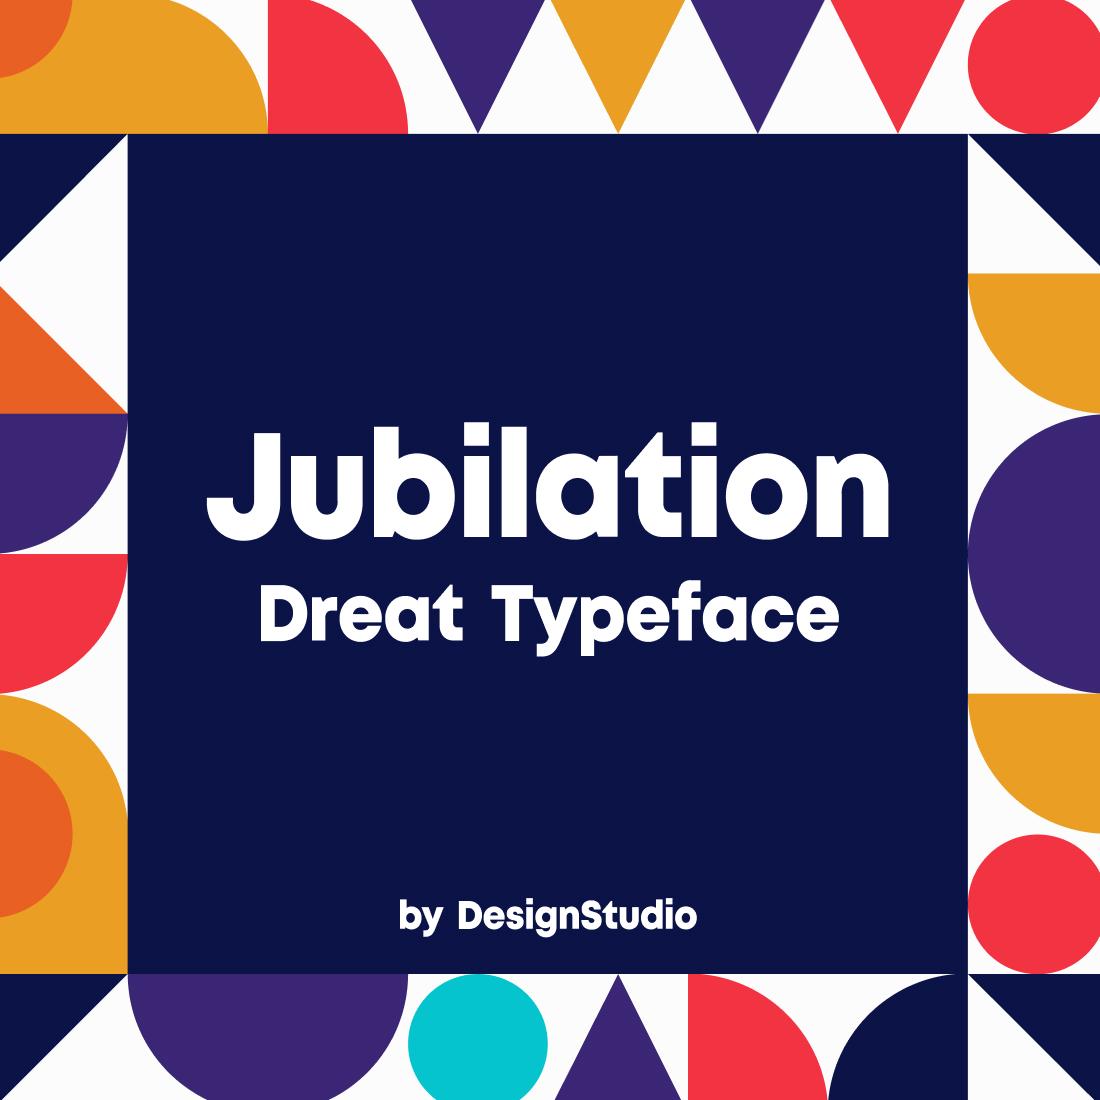 Jubilation Monospaced Sans Serif Font cover image.